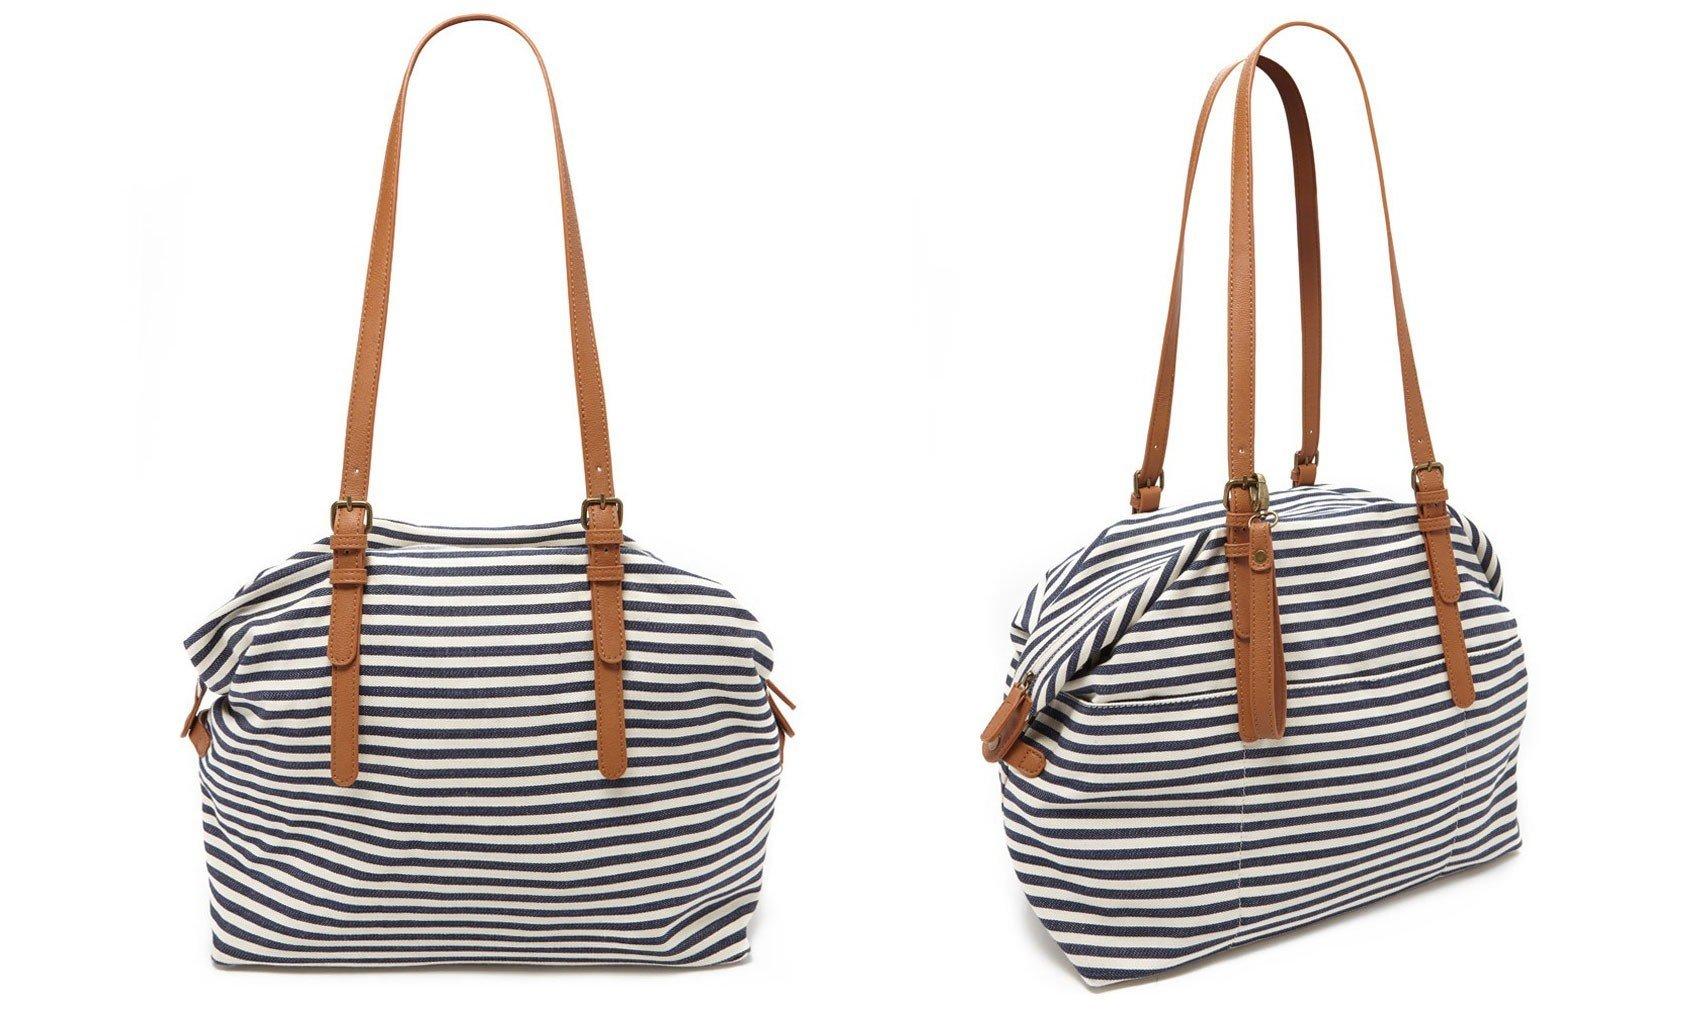 Style + Design handbag bag brown shoulder bag fashion accessory product tote bag leather pattern